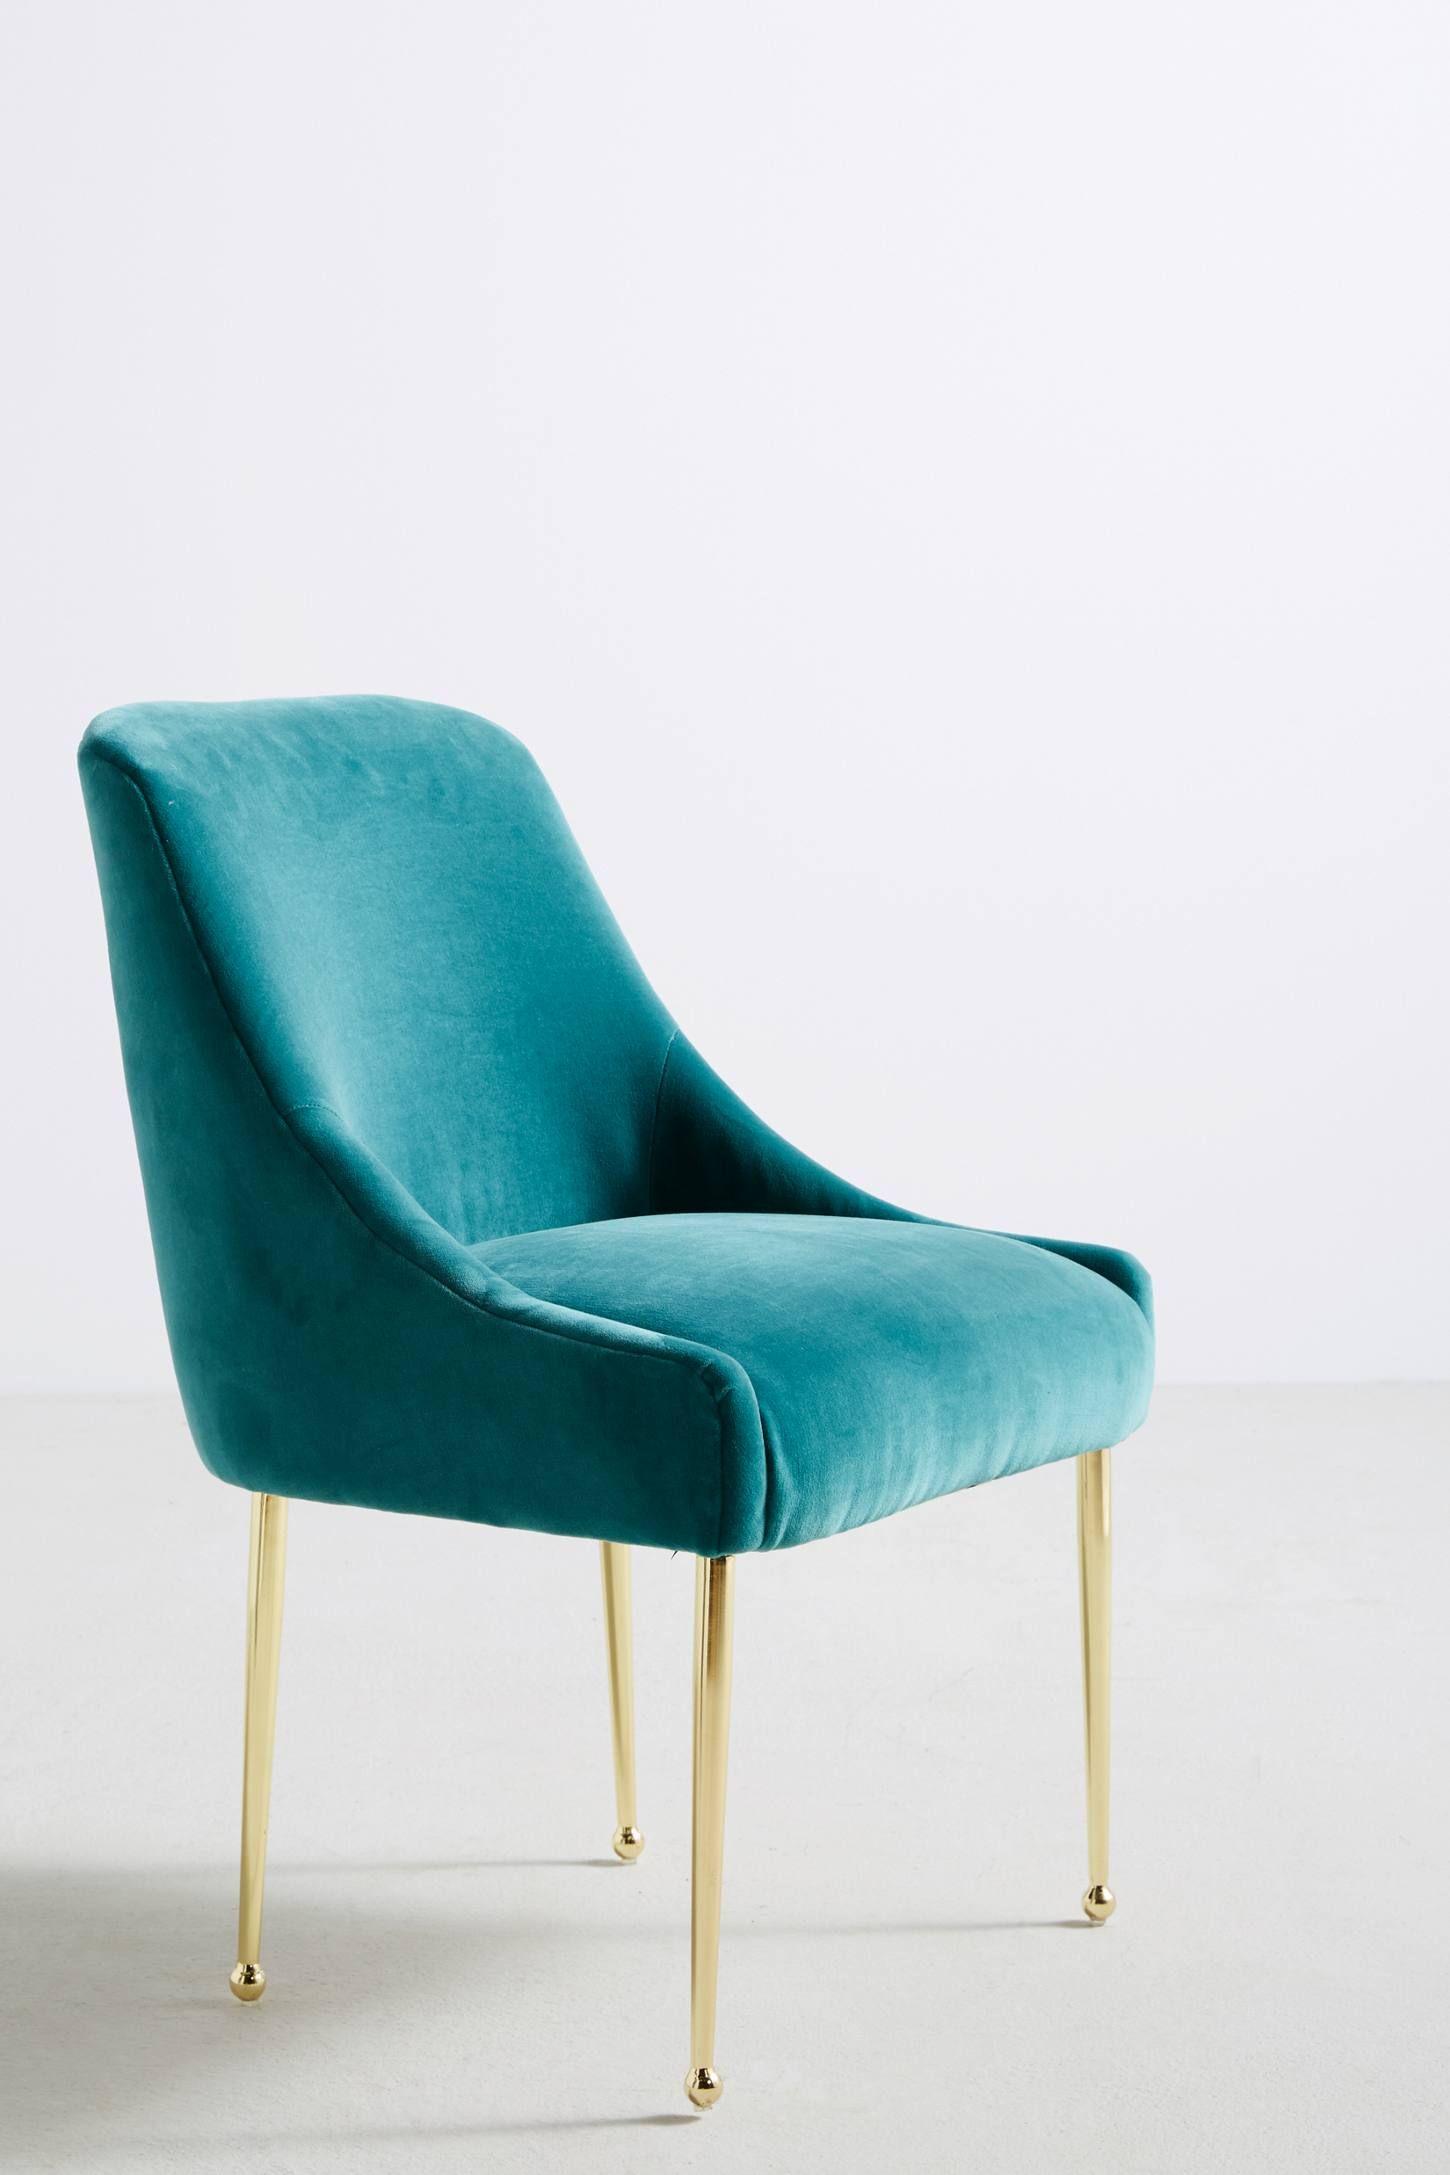 Best Velvet Elowen Chair By Anthropologie In Pink Size All 400 x 300